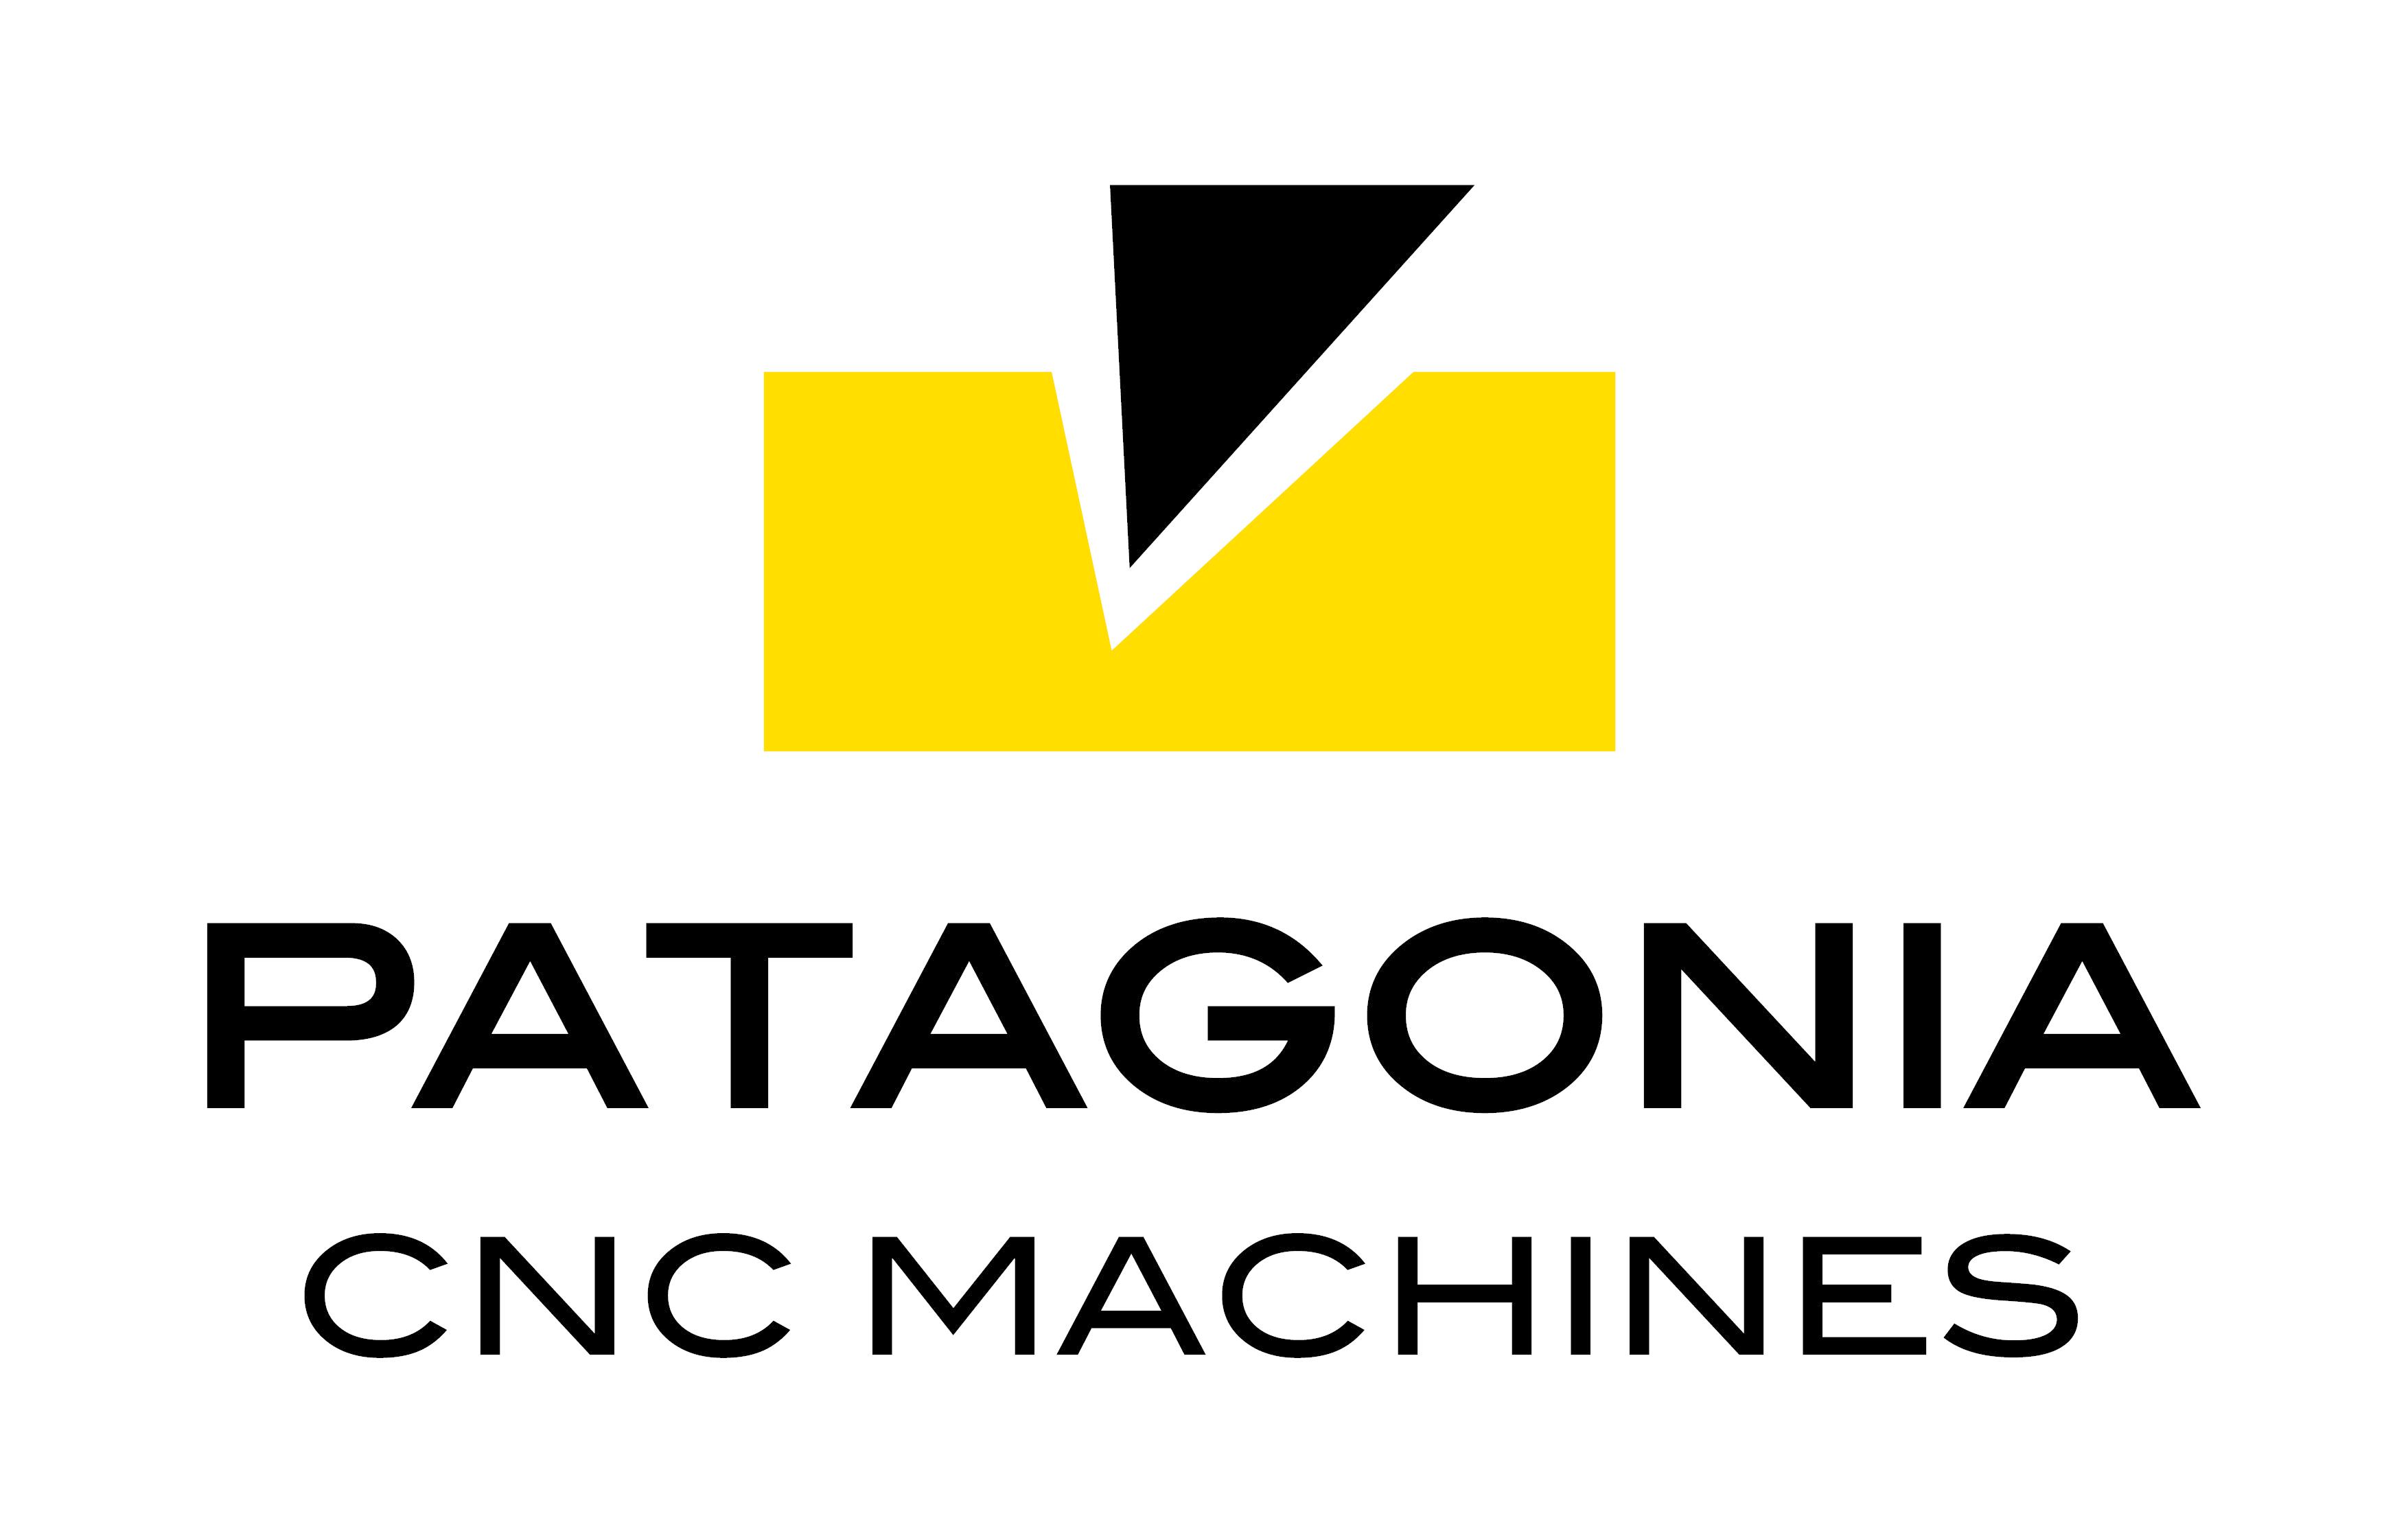 Patagonia CNC Machines – Robótica, Routers, Laser, Automatizaciones